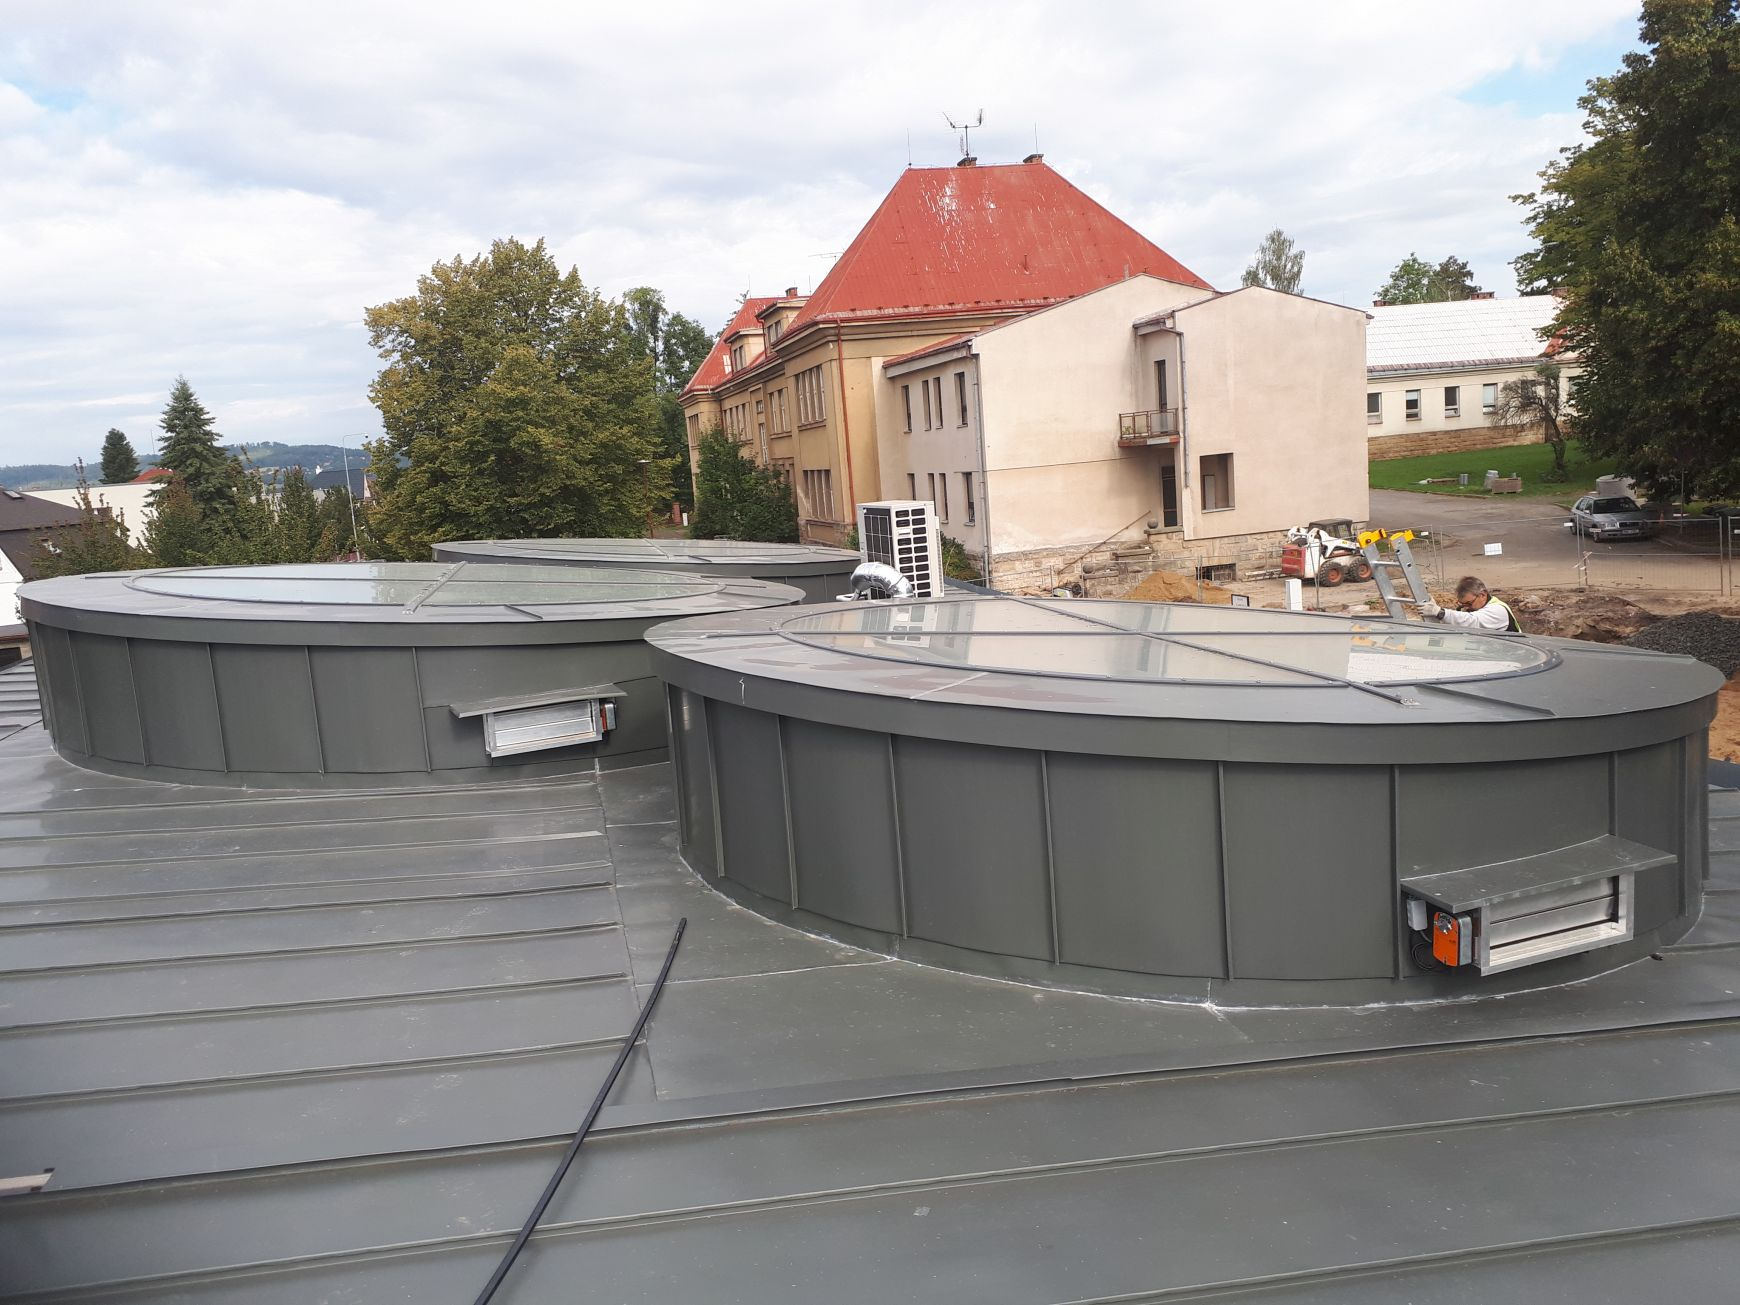 ART OF ZINC 2020 Střecha 2. místo_PARIO s.r.o., RHEINZINK- prePATINA schiefergrau